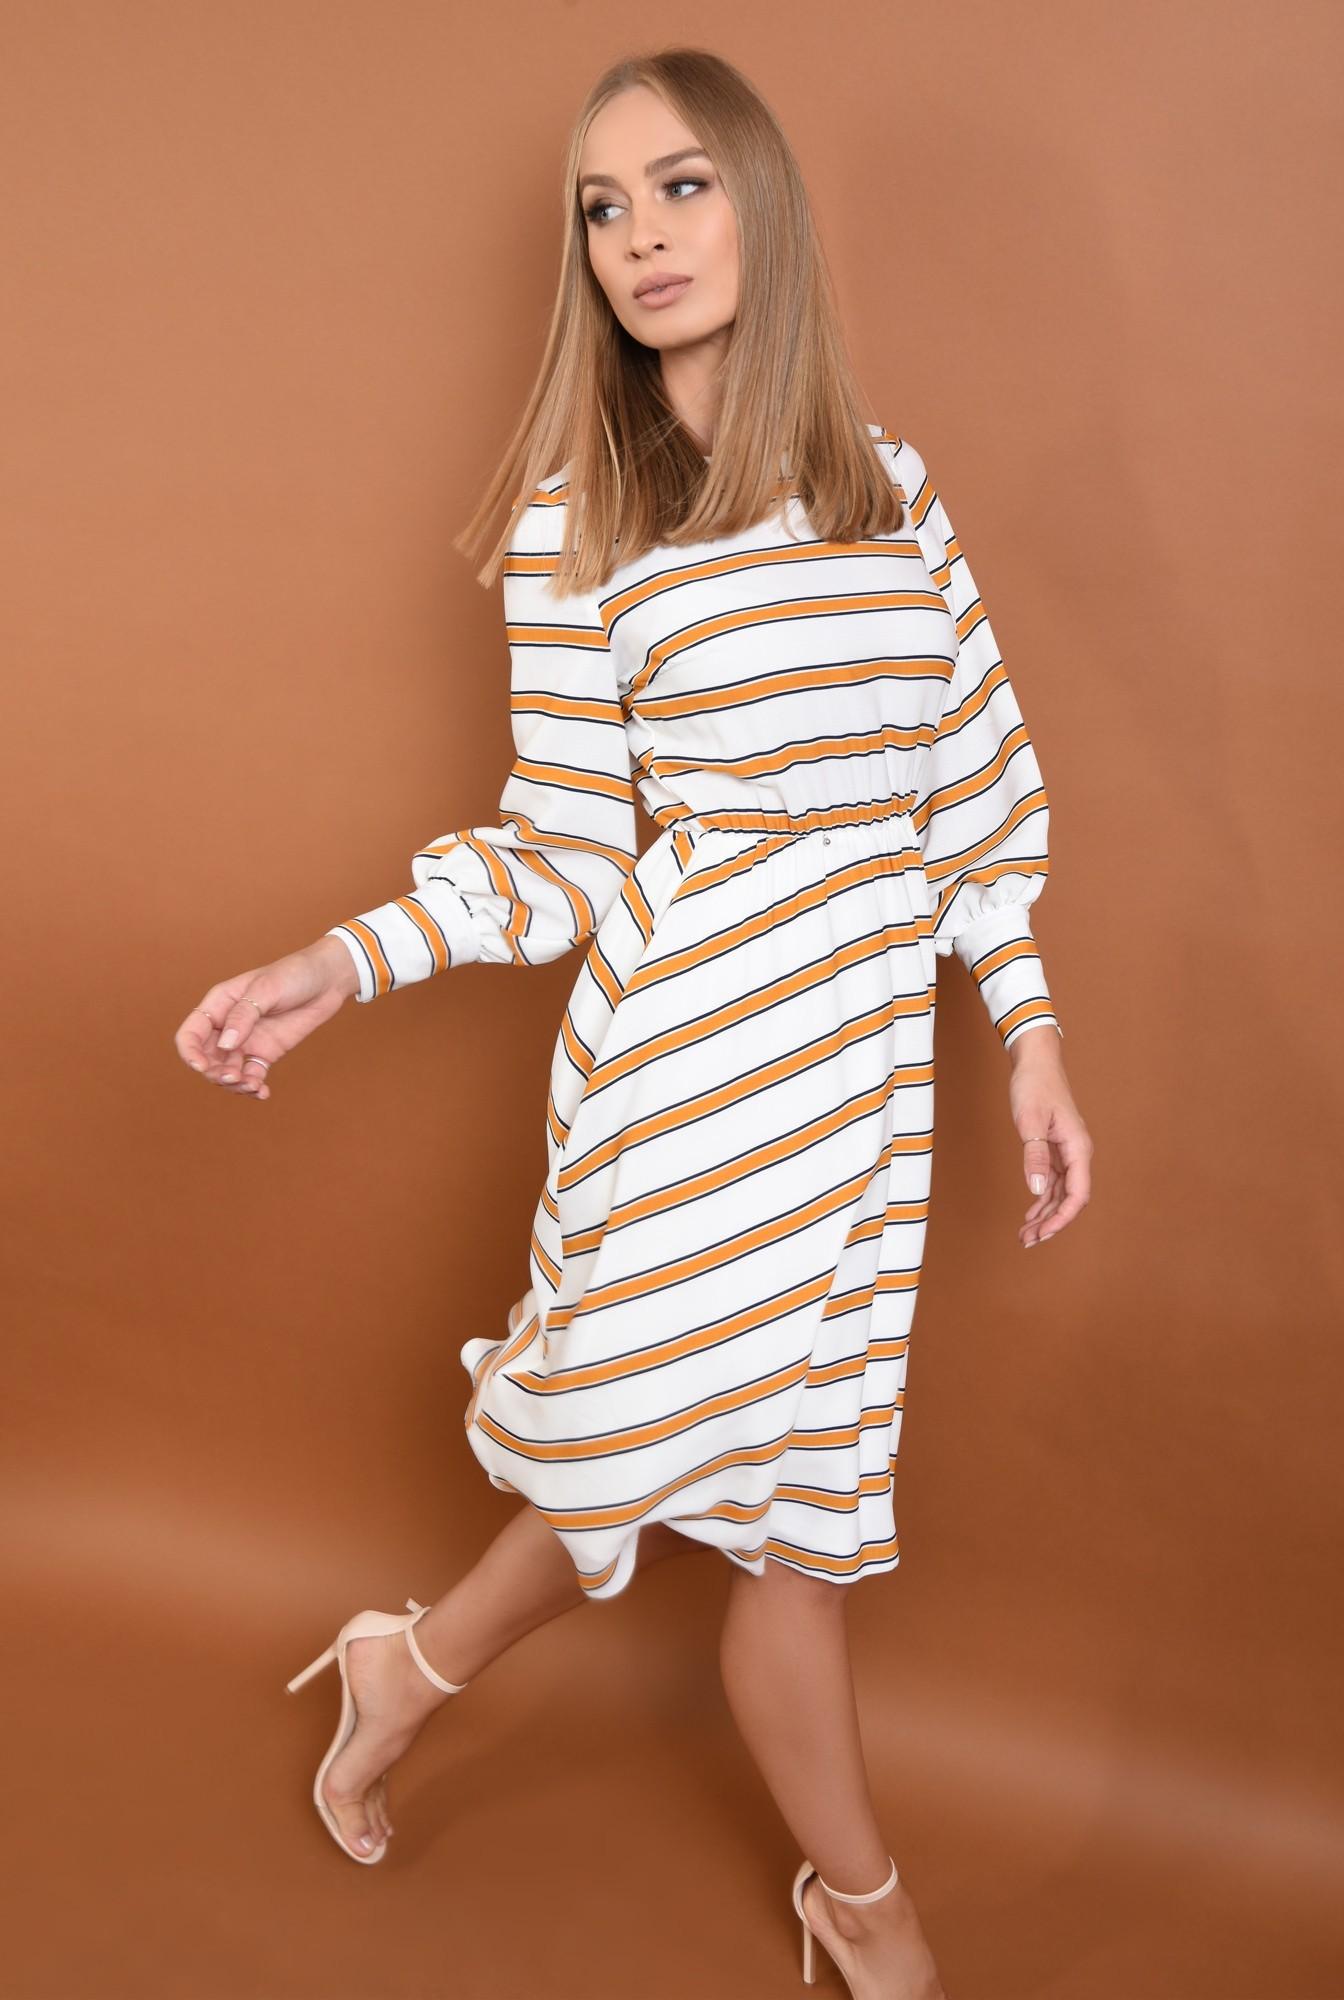 0 - 360 - rochie casual imprimata, alb, mustar, bie, cusatura in talie